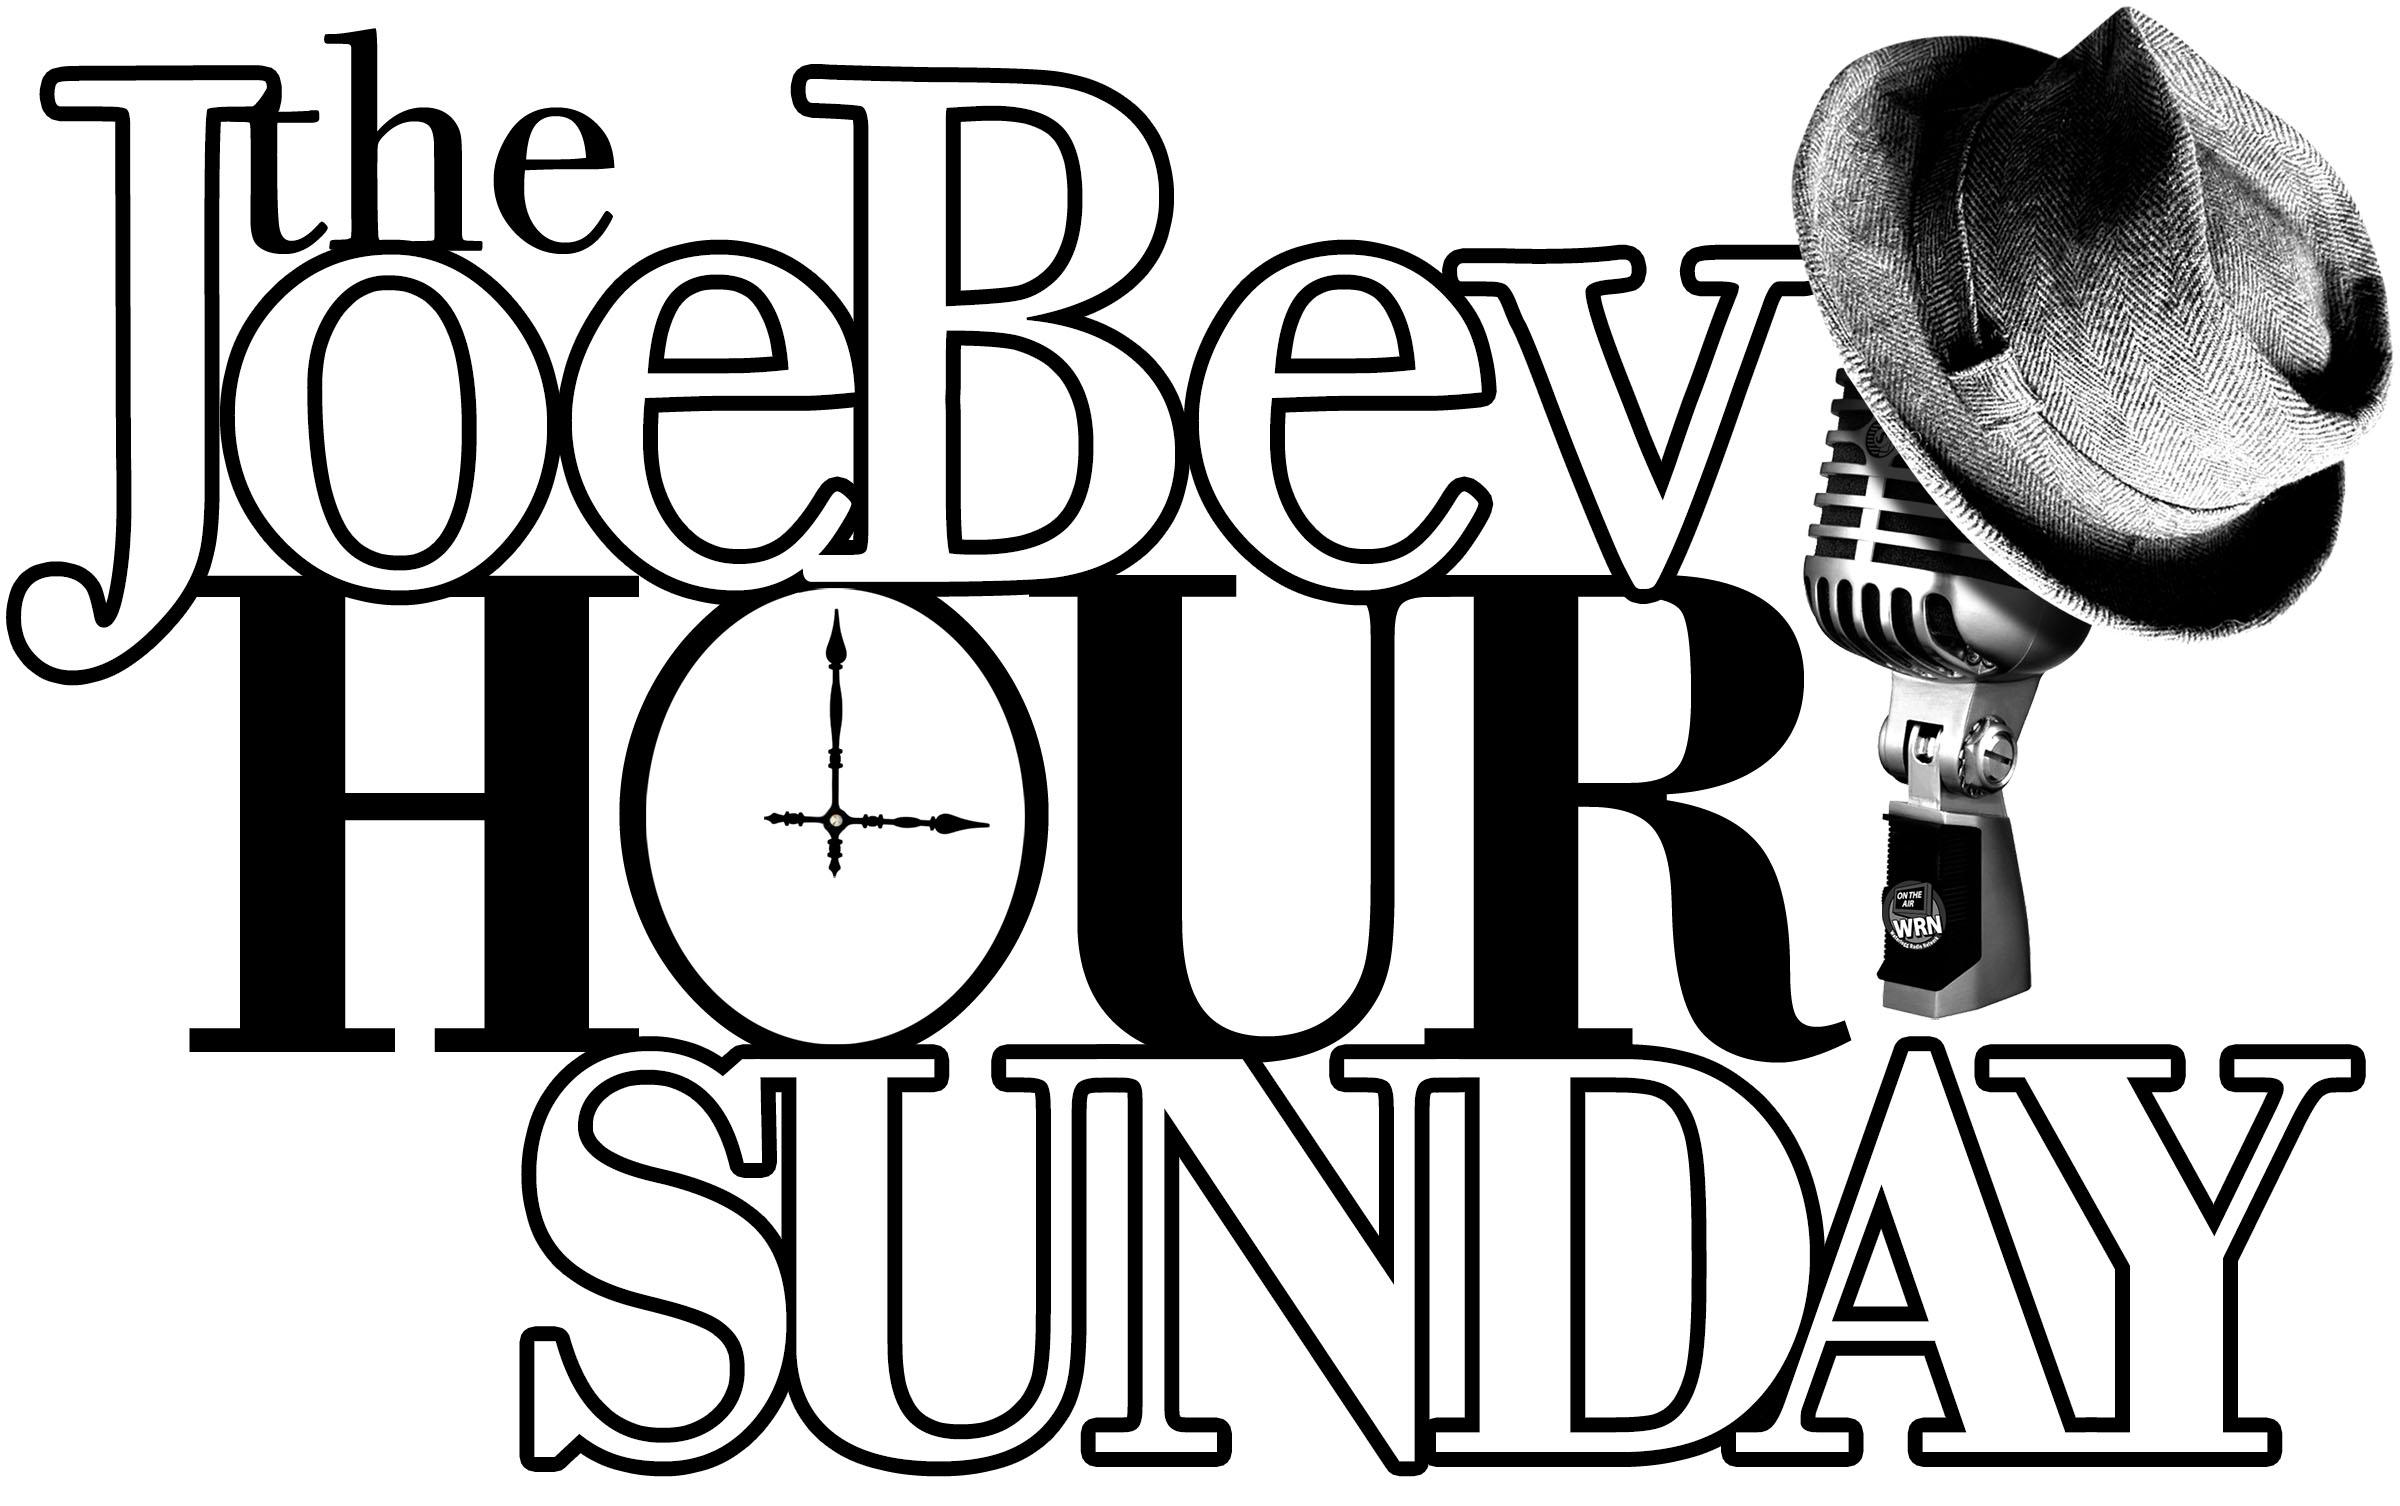 JOEBEV-HOUR-SUNDAY-HAT-LOGO-02-2400wide.jpg